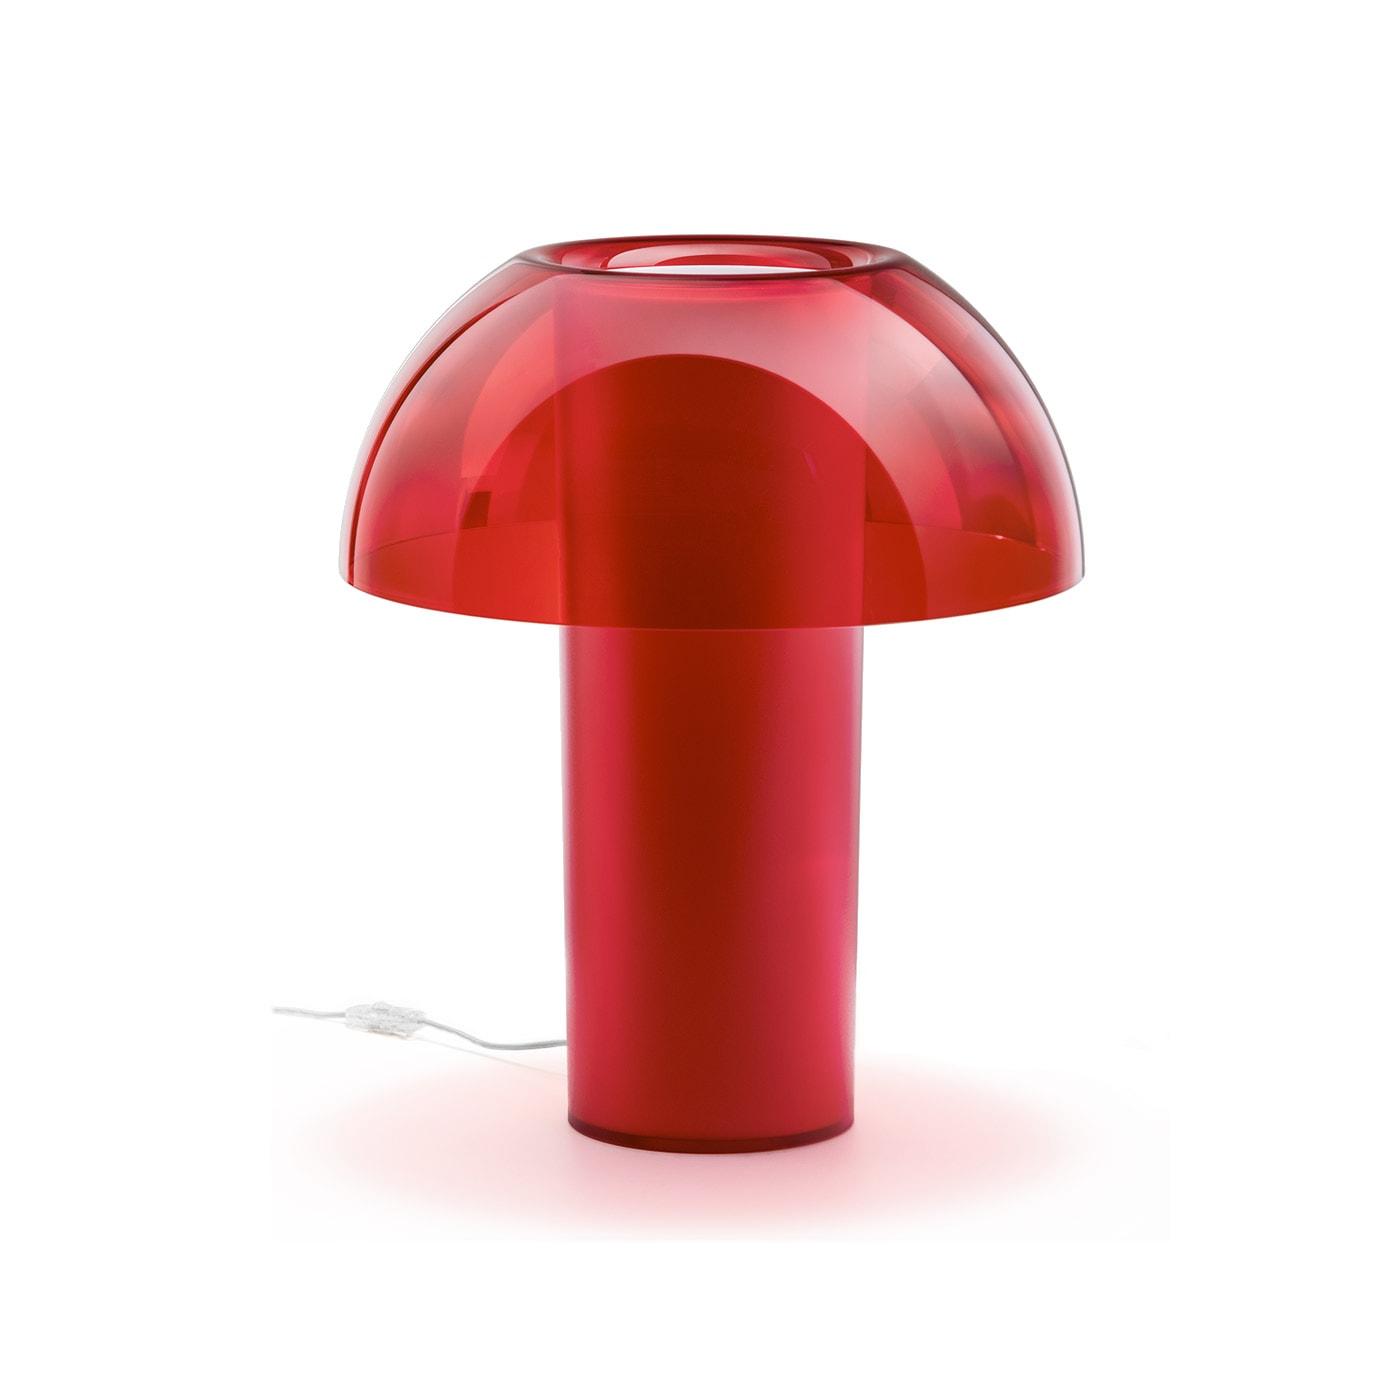 PEDRALI Colette lampada rossa